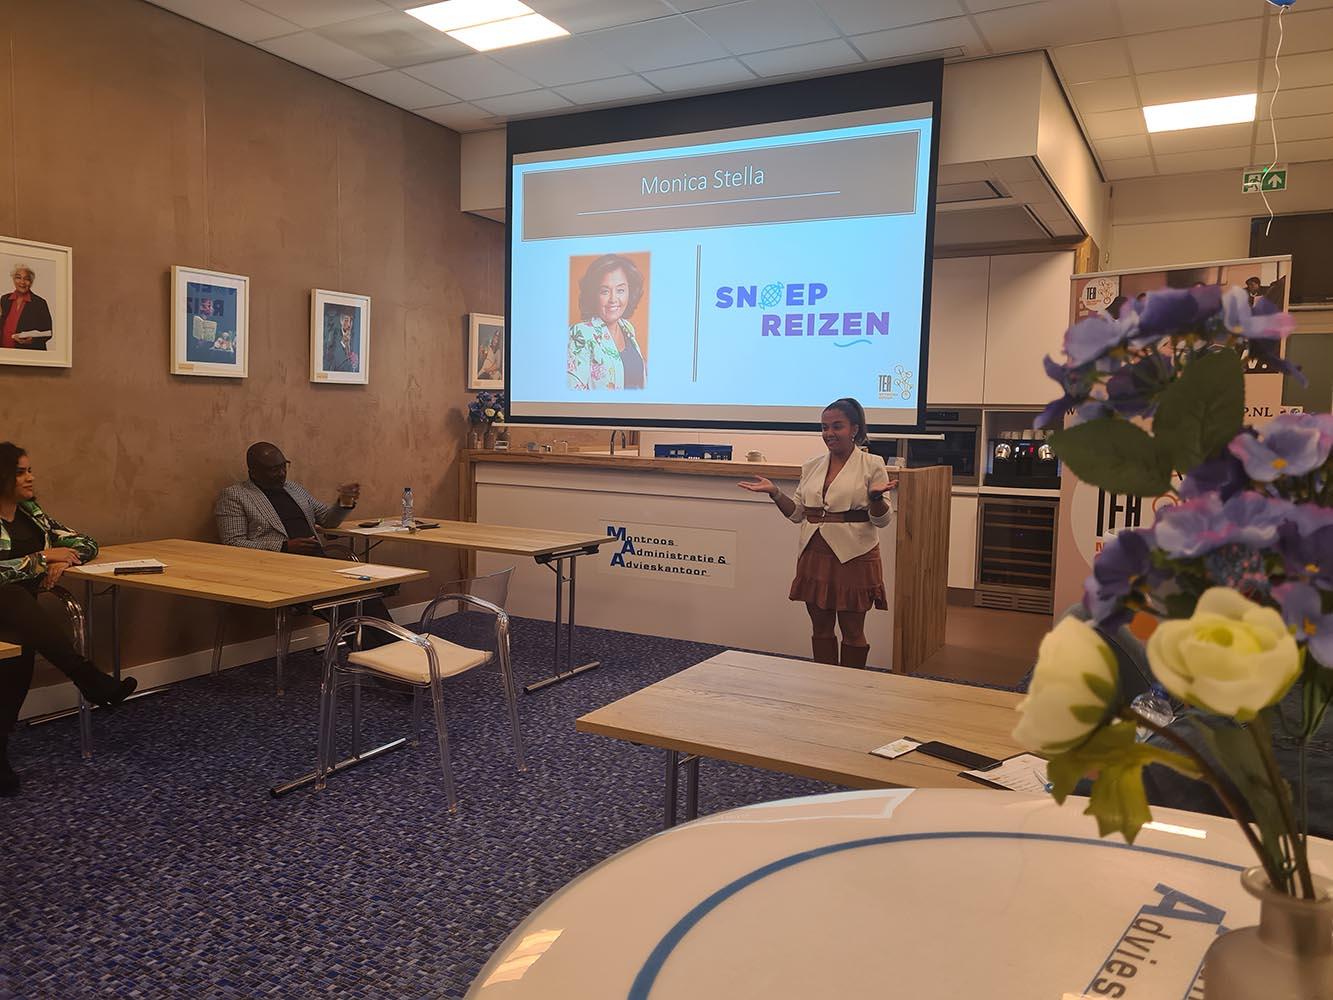 TEA Network Group – Netwerken voor ondernemers/Afrikaanse Diaspora